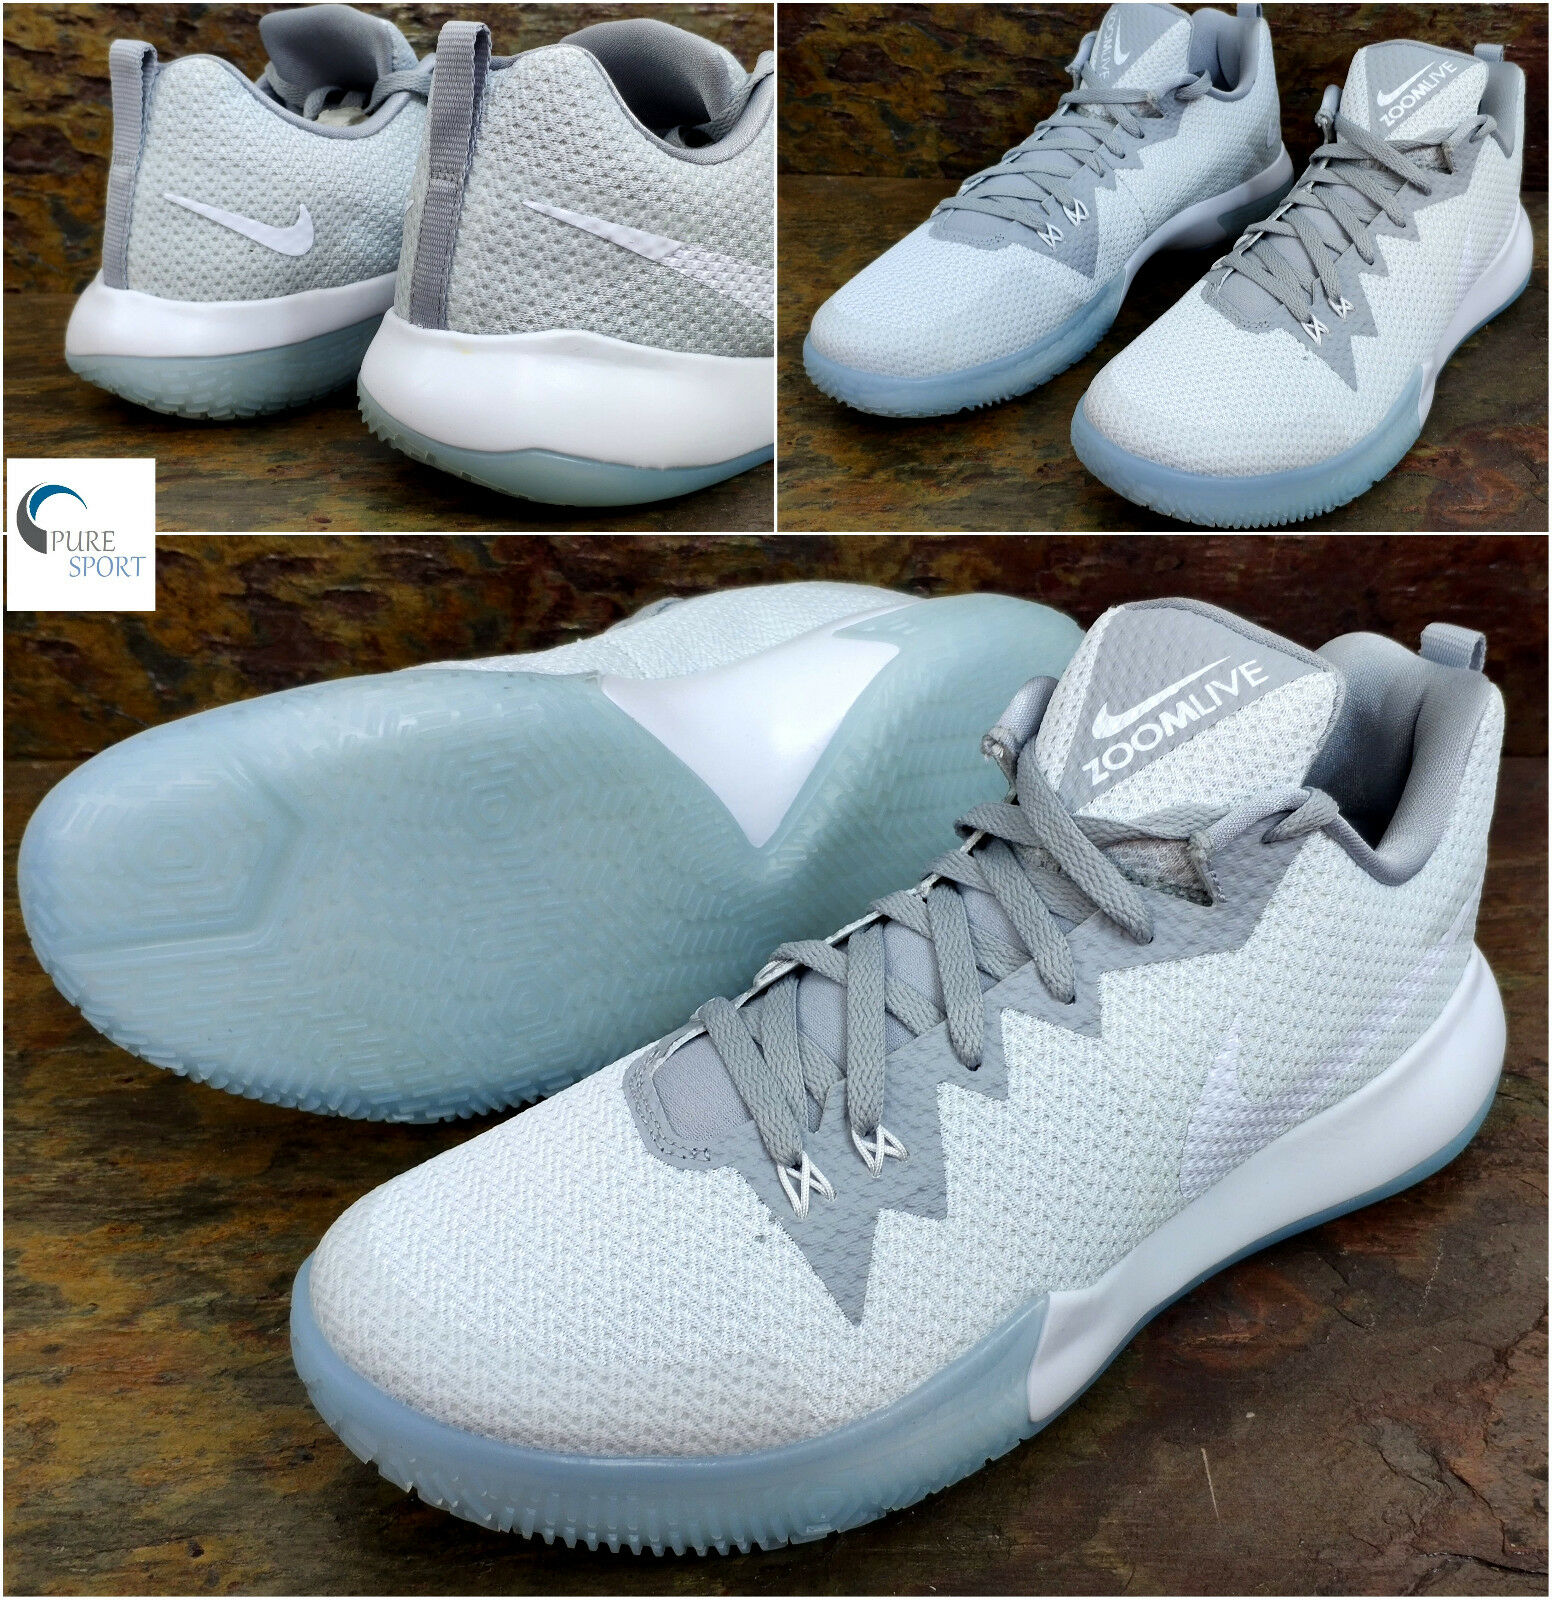 Nike Zoom Live II  Basketball Trainers   Uk 12 Eu 47.5     AH7566-101   PureS